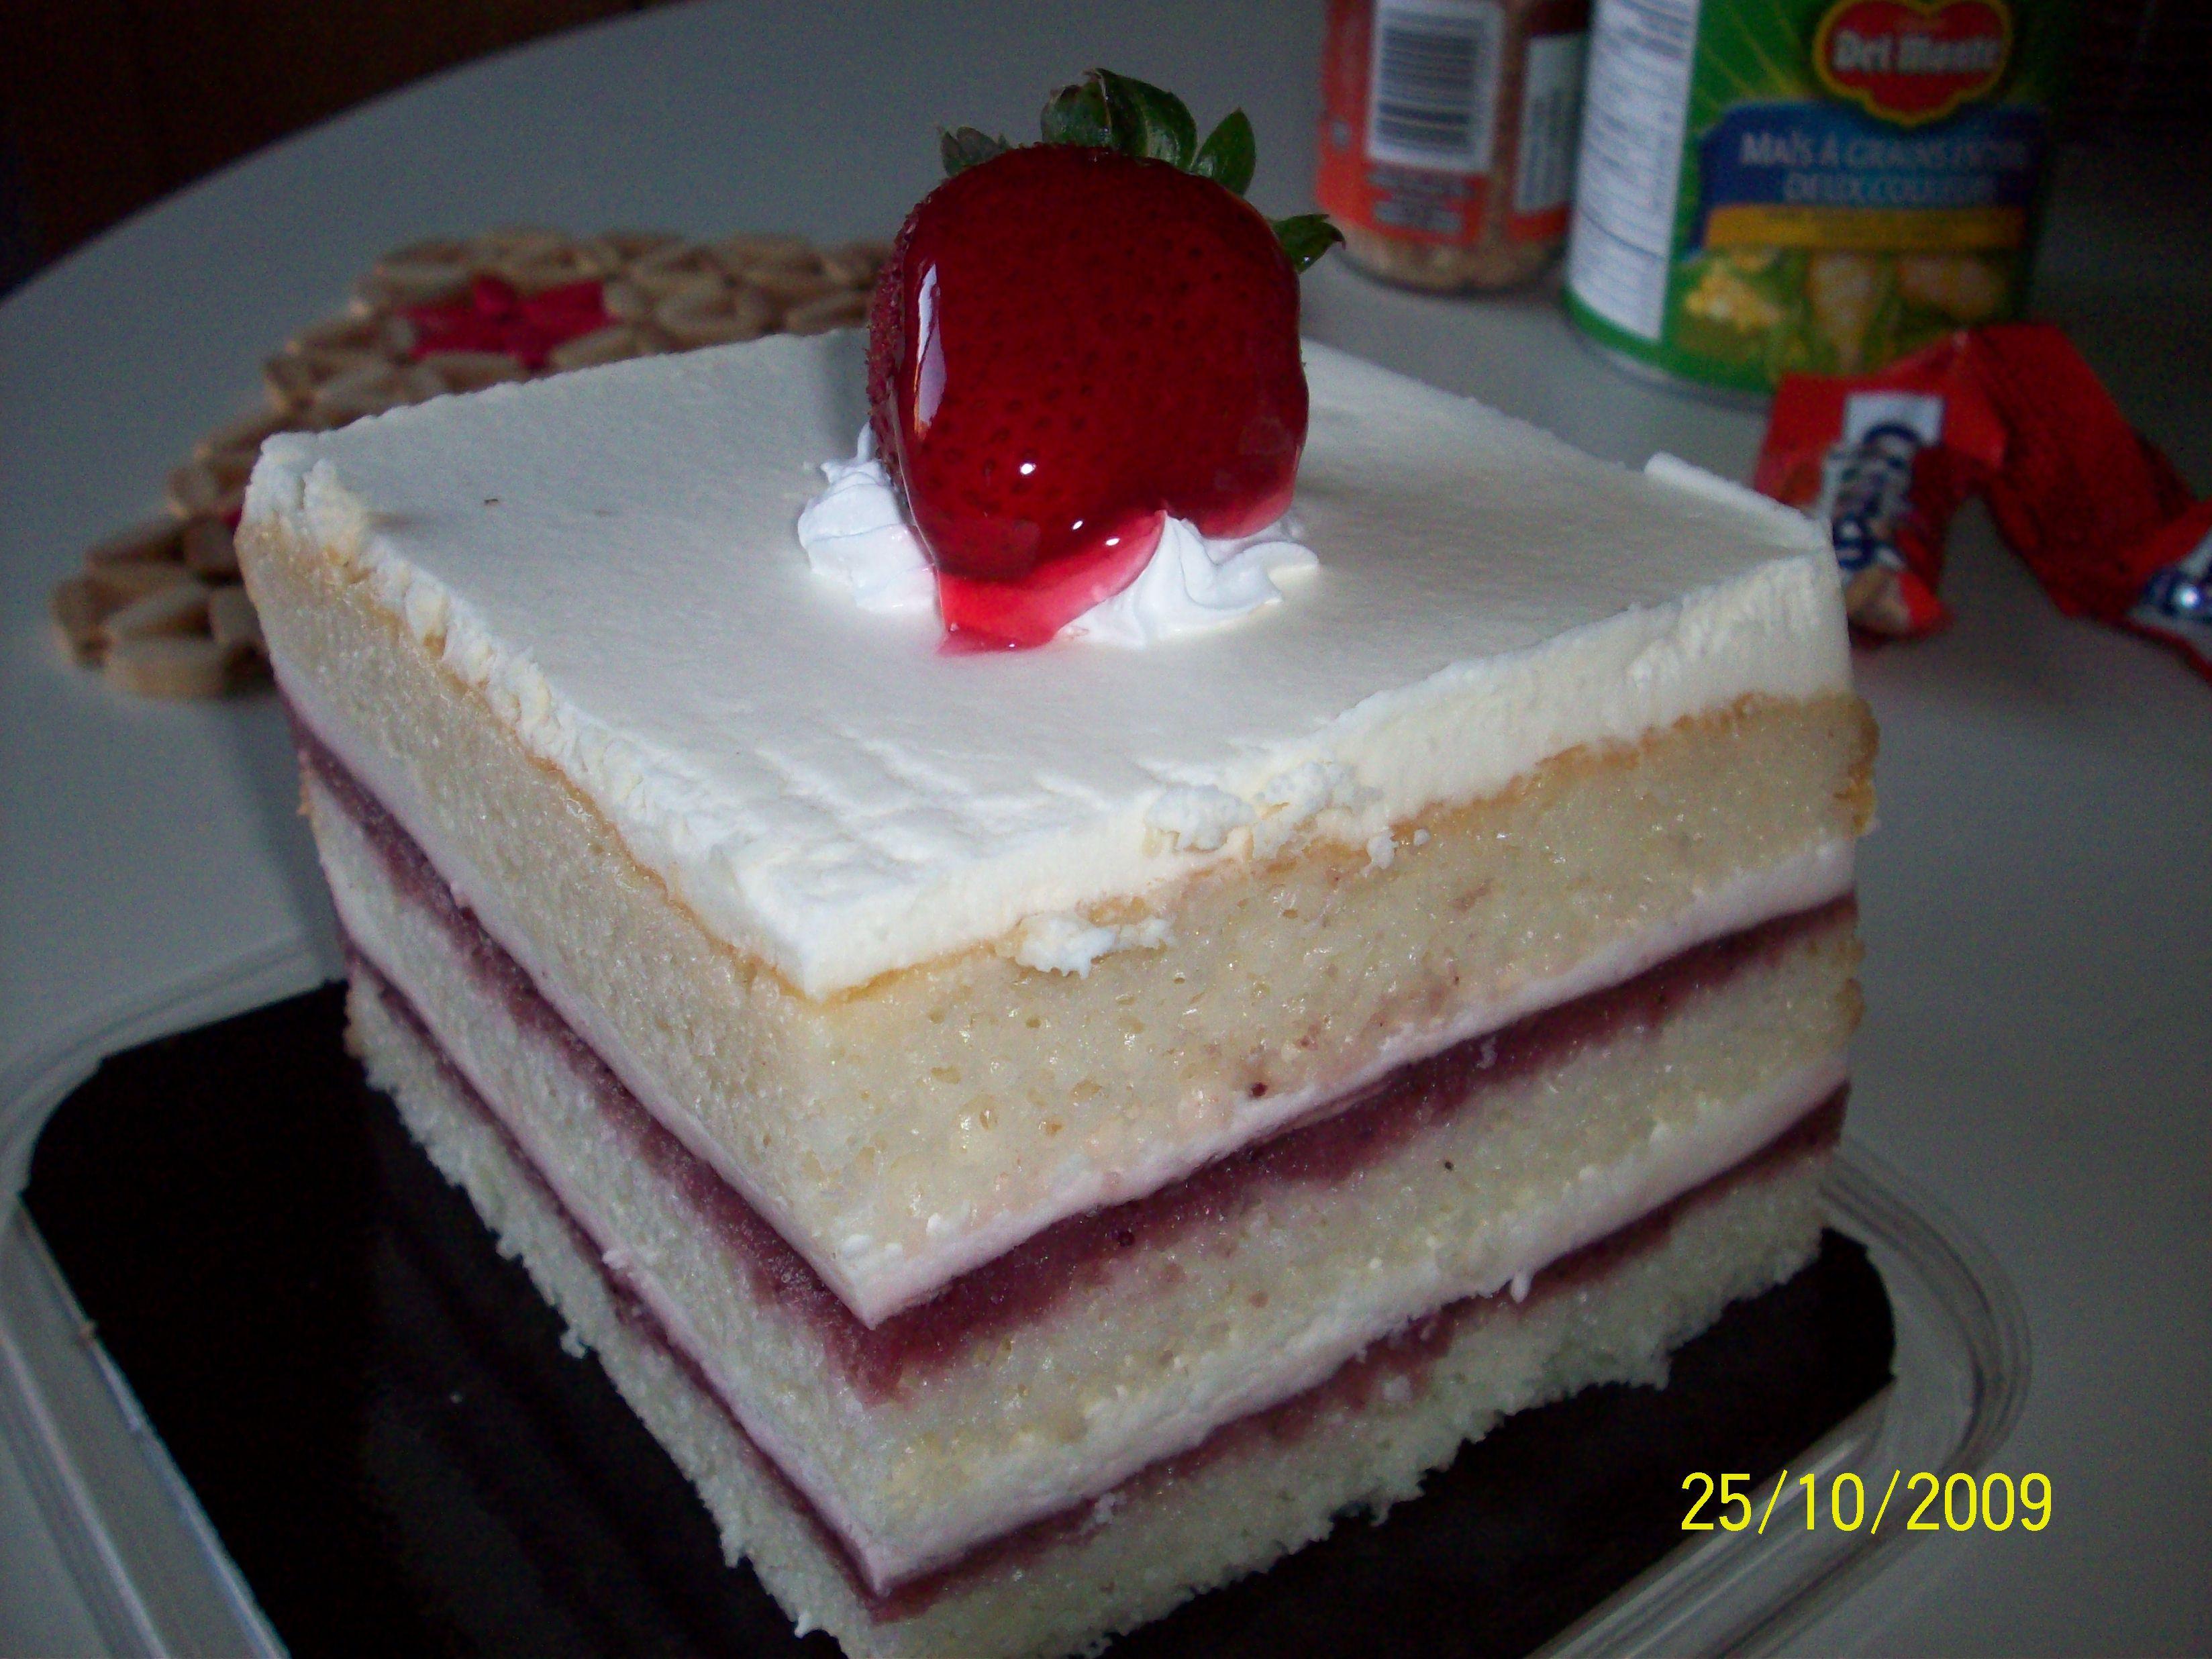 http://foodloader.net/cutie_2009-10-25_Strawberry_Shortcake.jpg